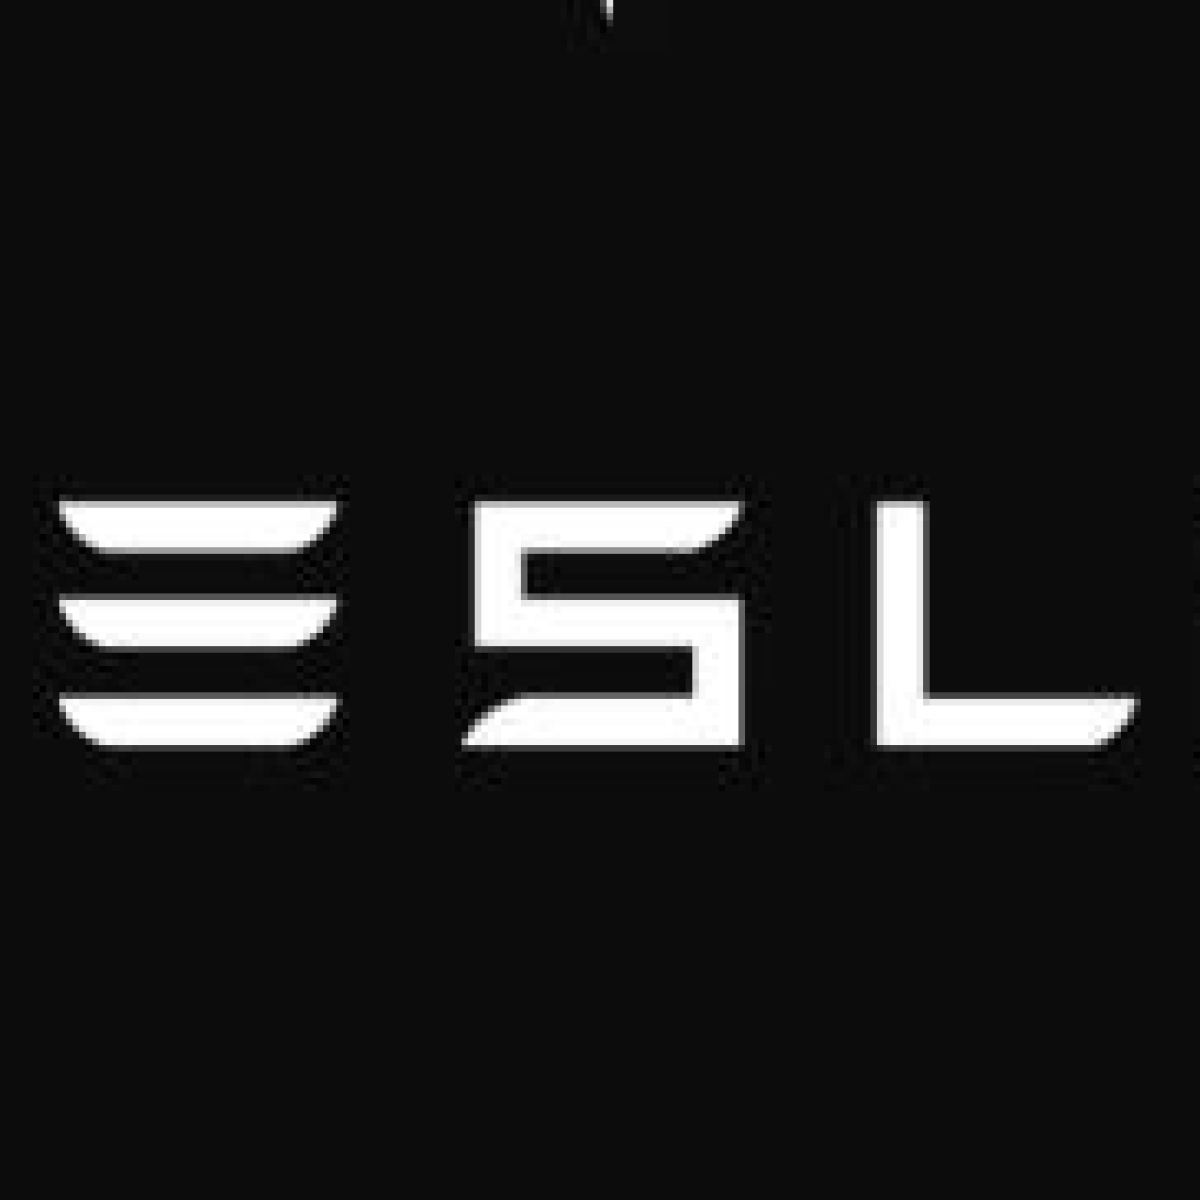 Tesla is coming to India in early 2021, confirms Nitin Gadkari